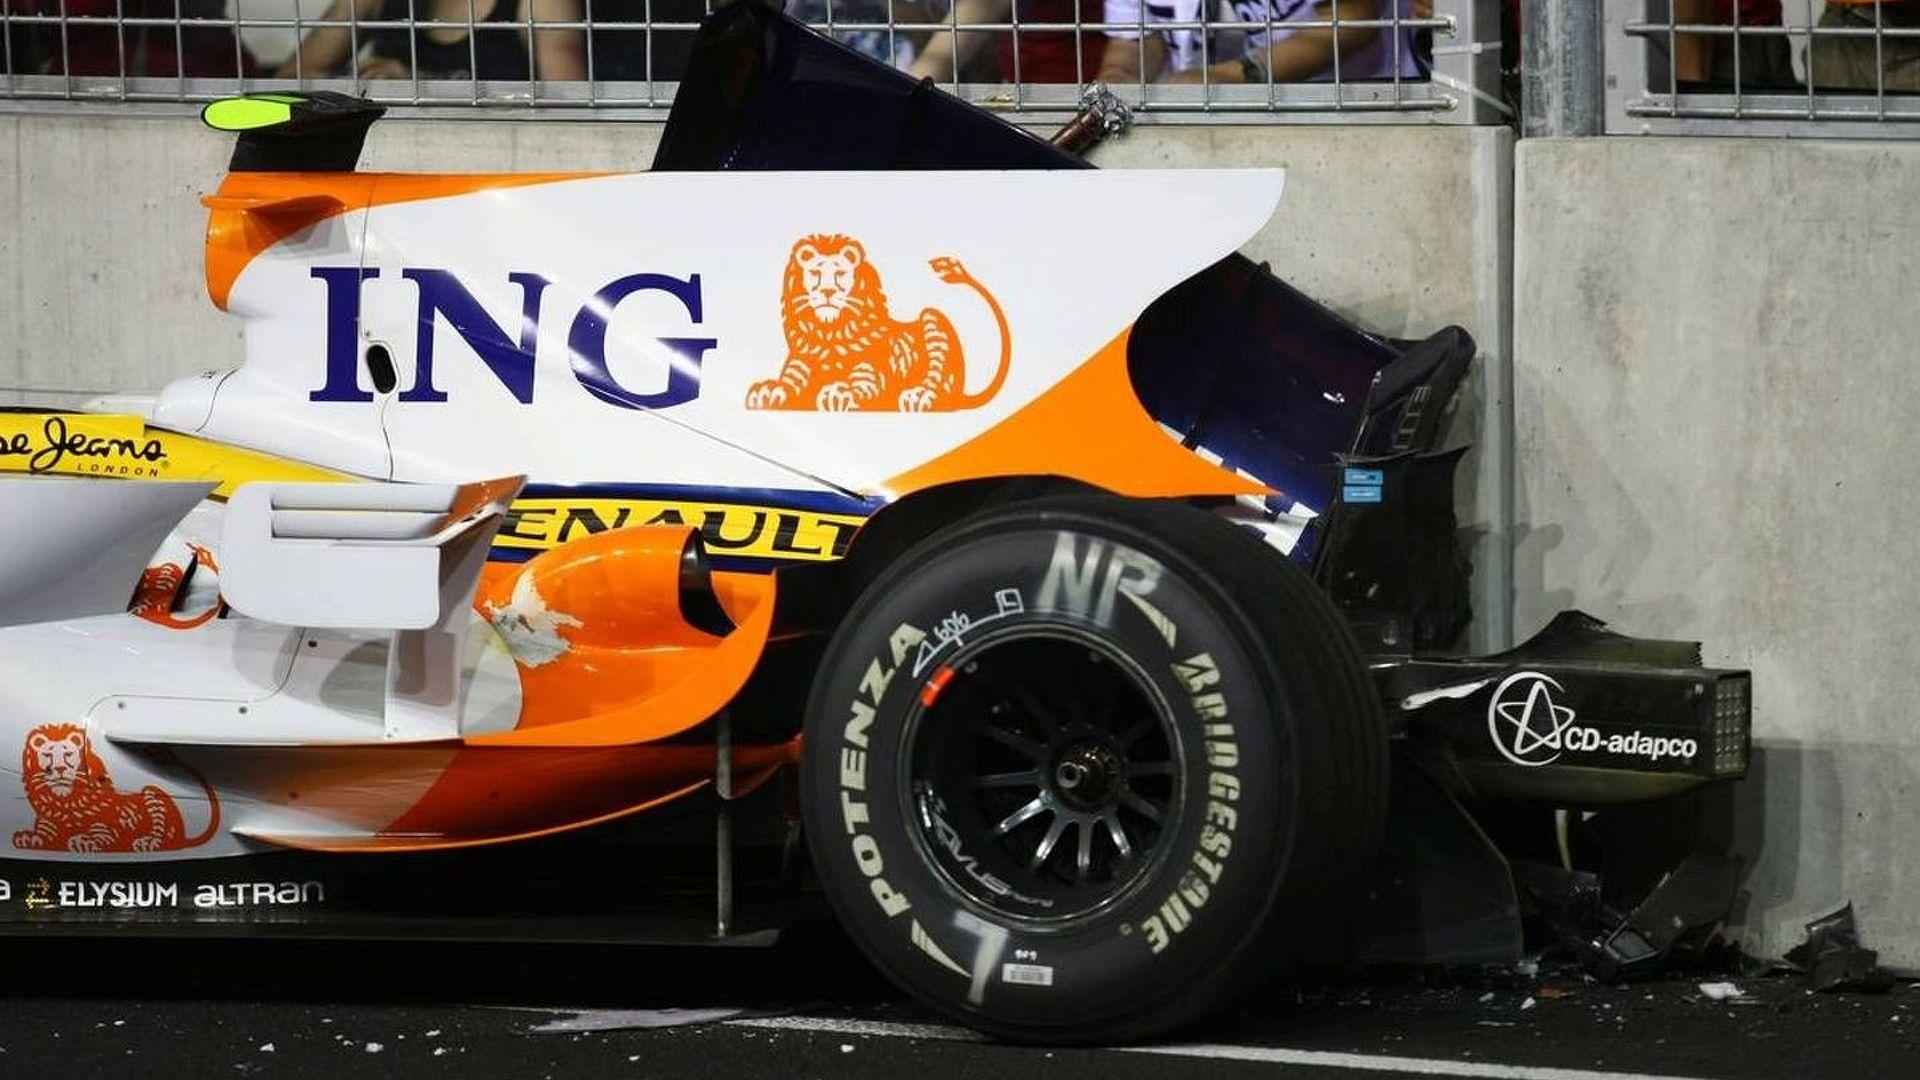 Massa confronted Briatore about Piquet crash